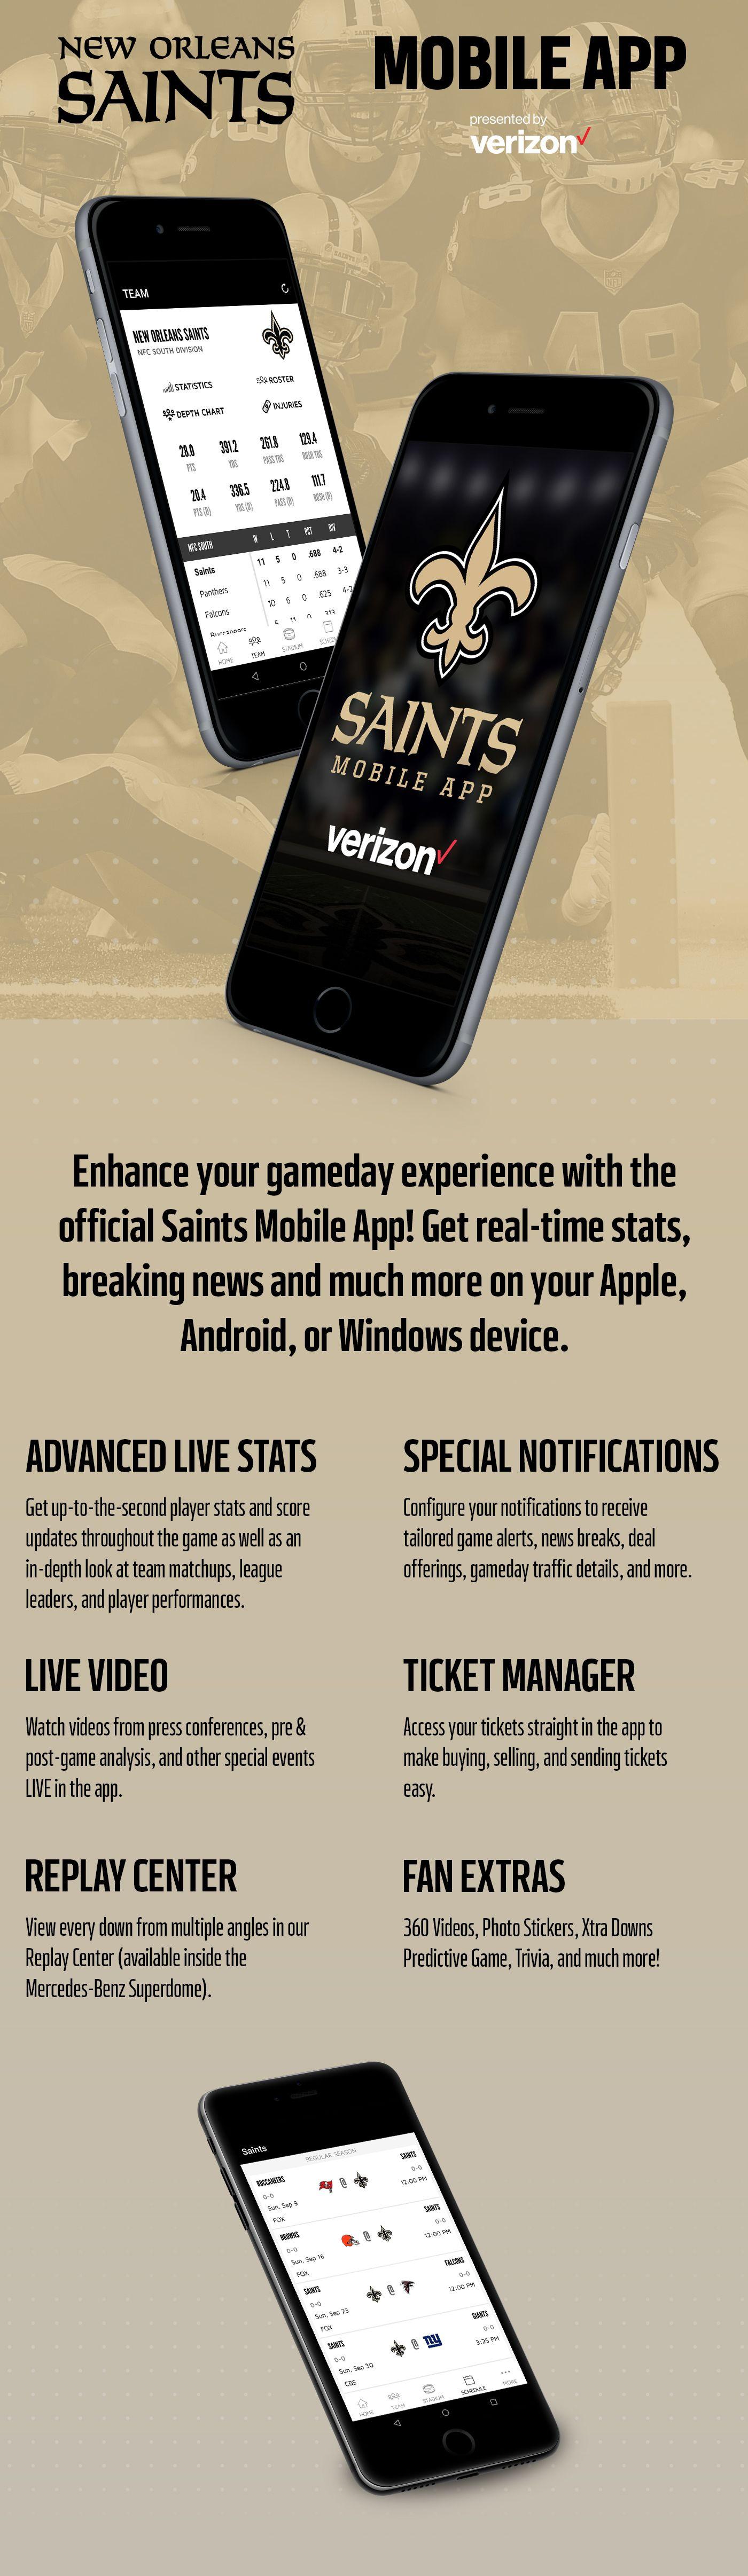 mobile-app-tall